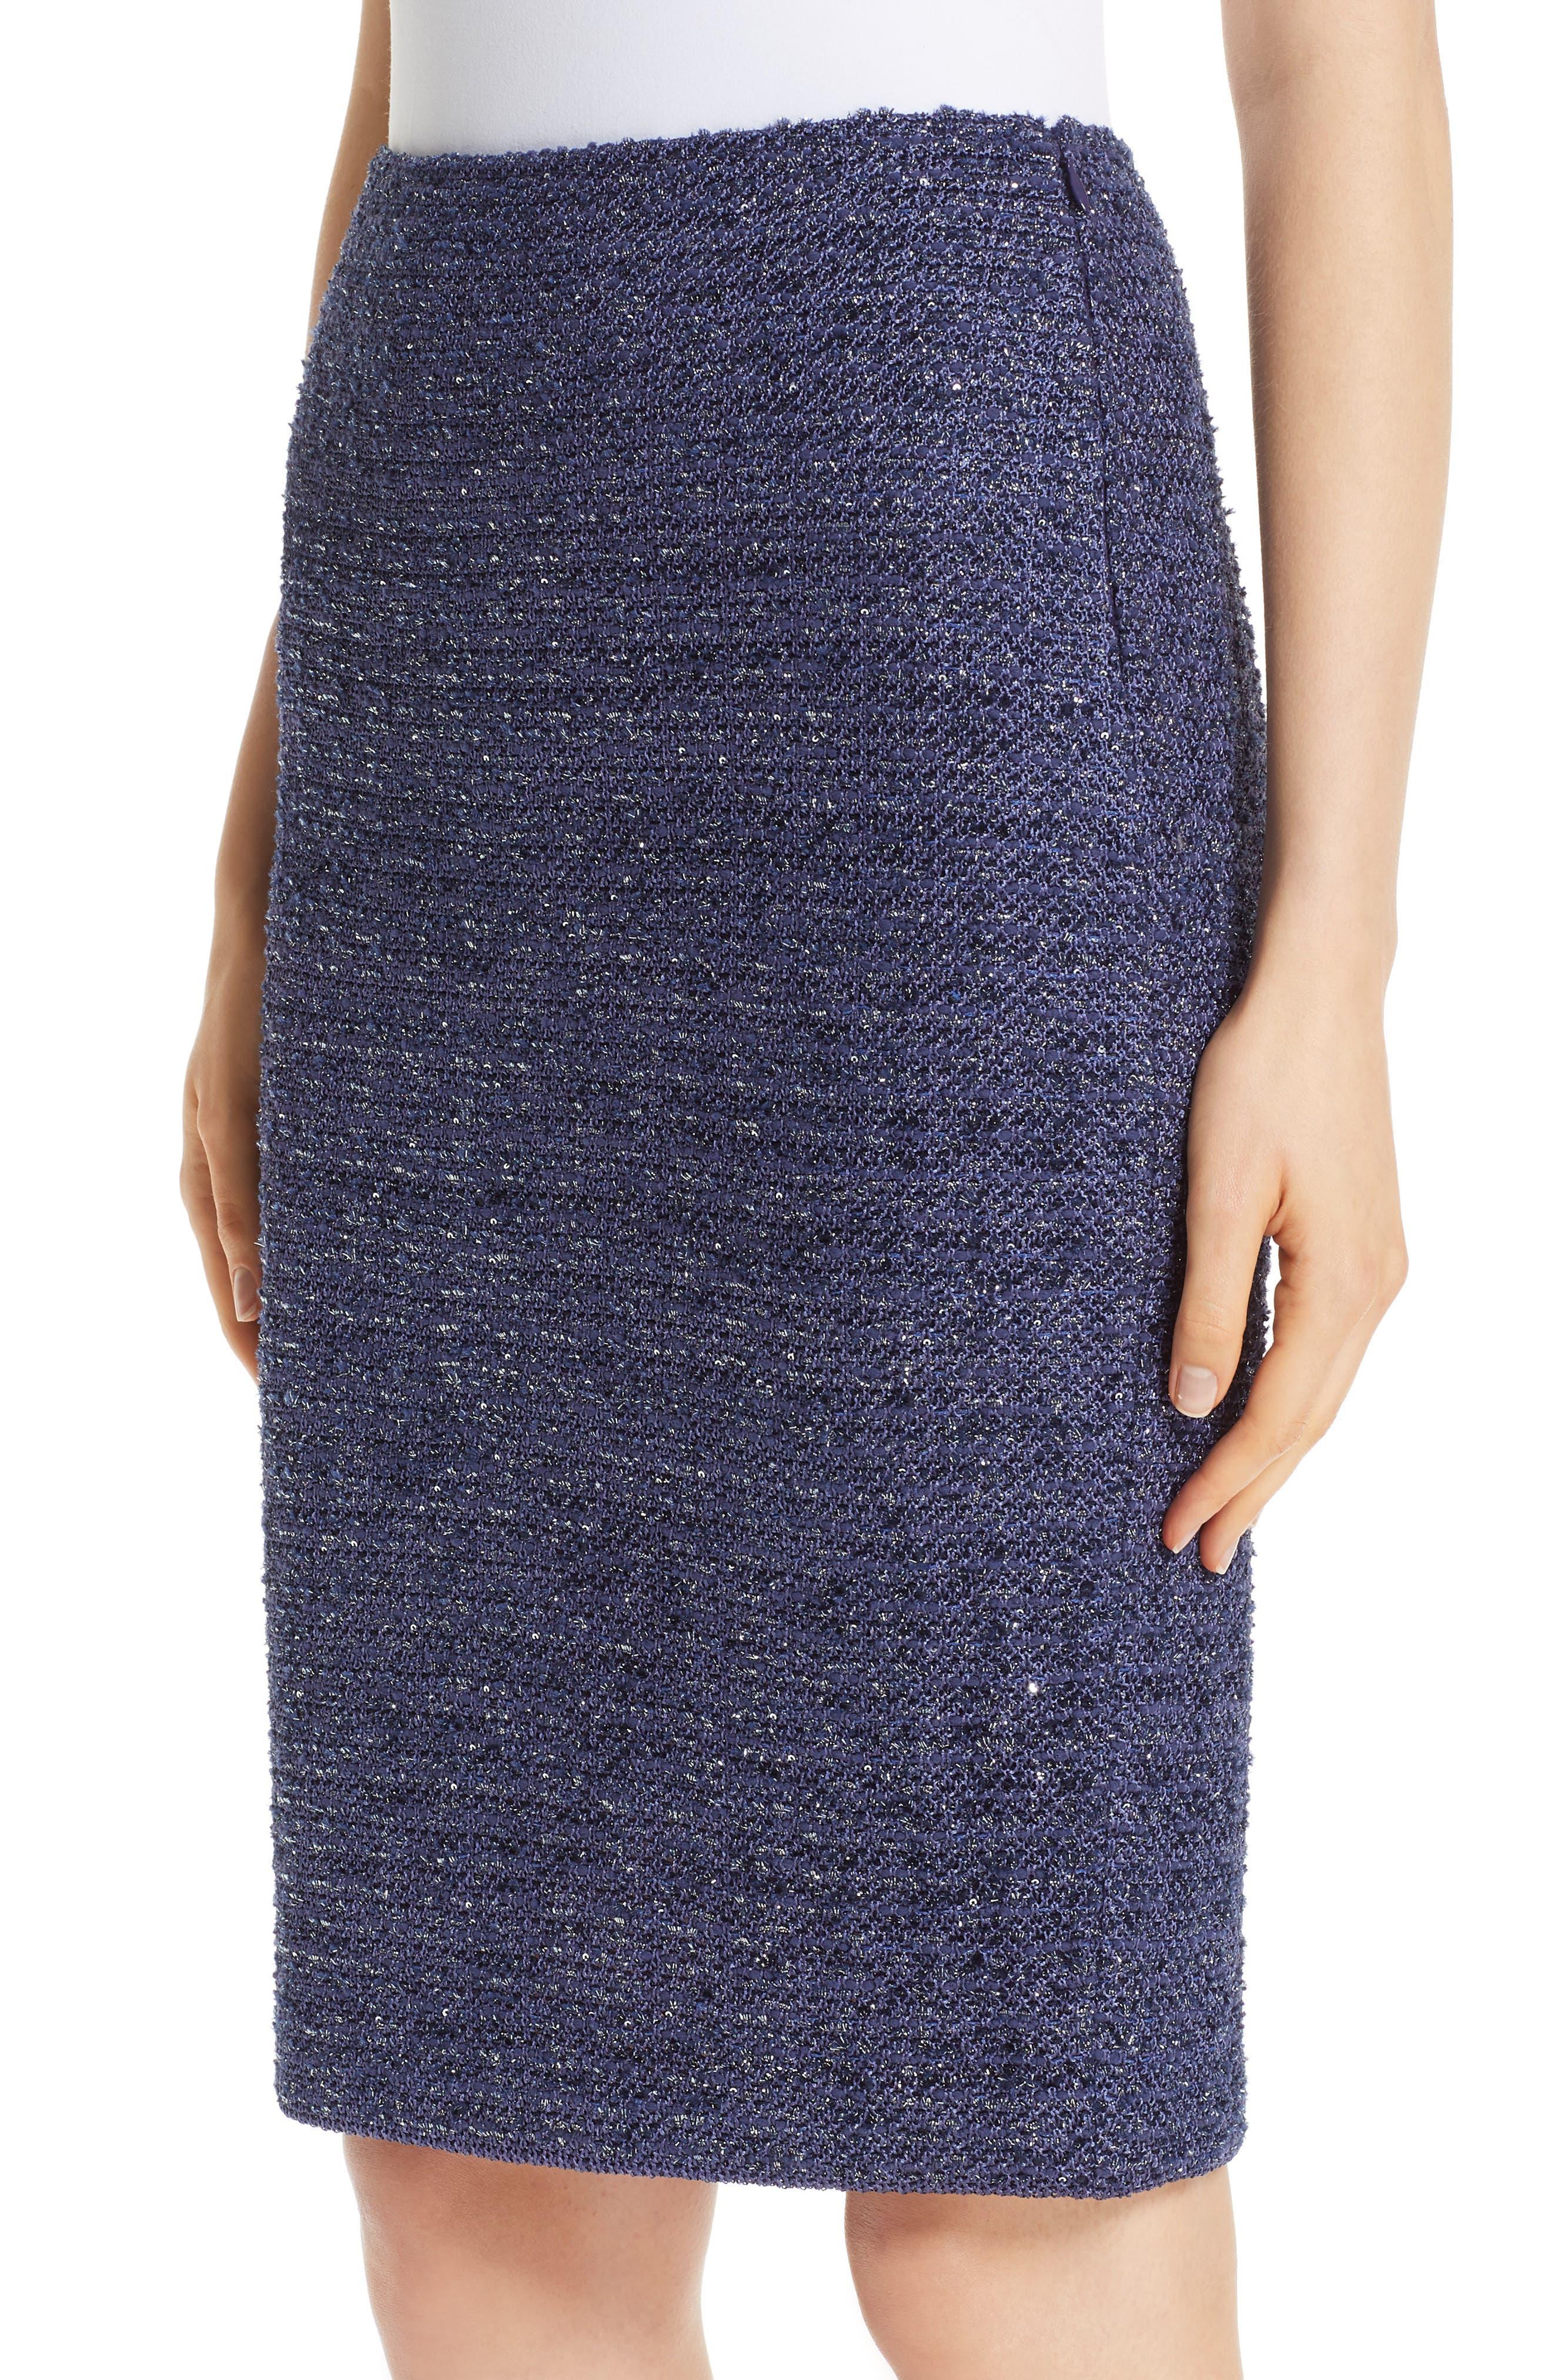 Starlight Knit Pencil Skirt,                             Alternate thumbnail 4, color,                             VIOLA MULTI